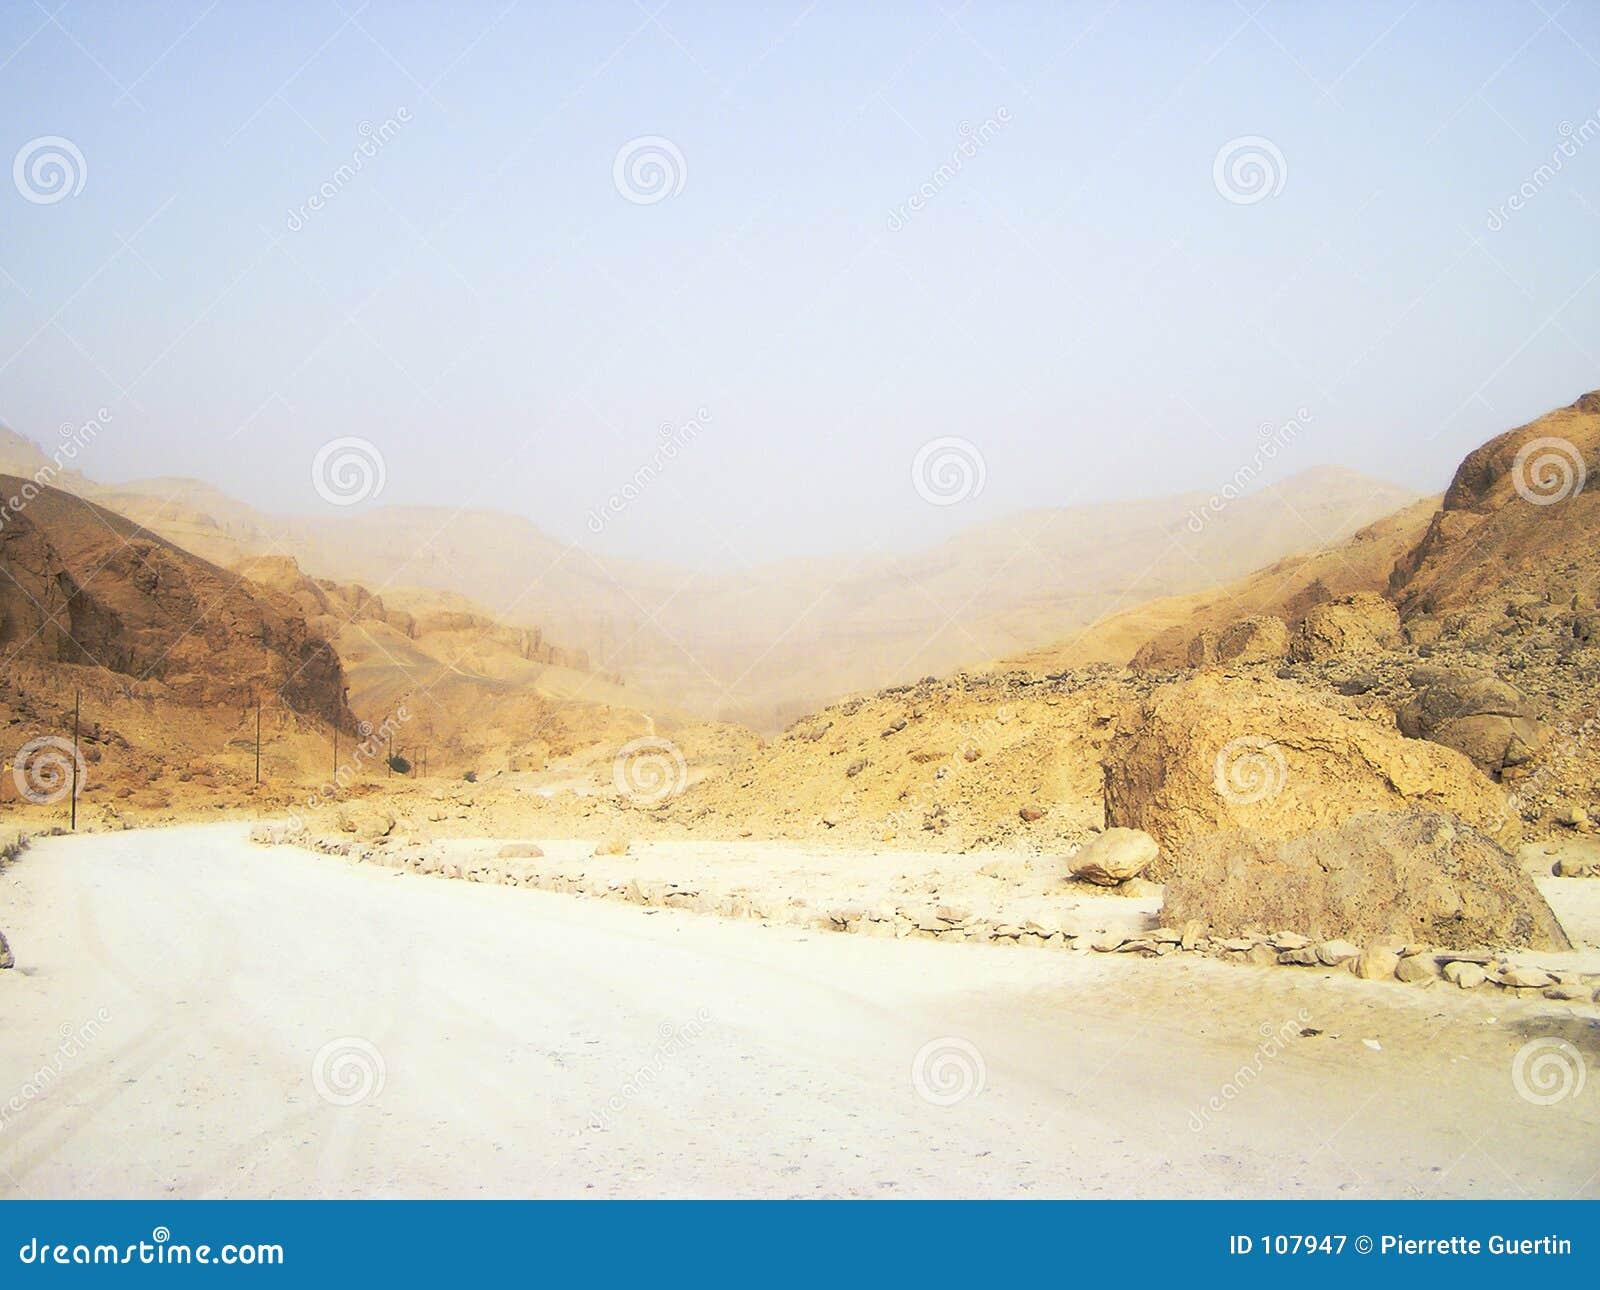 Pátio abandonado 3, Egipto, África